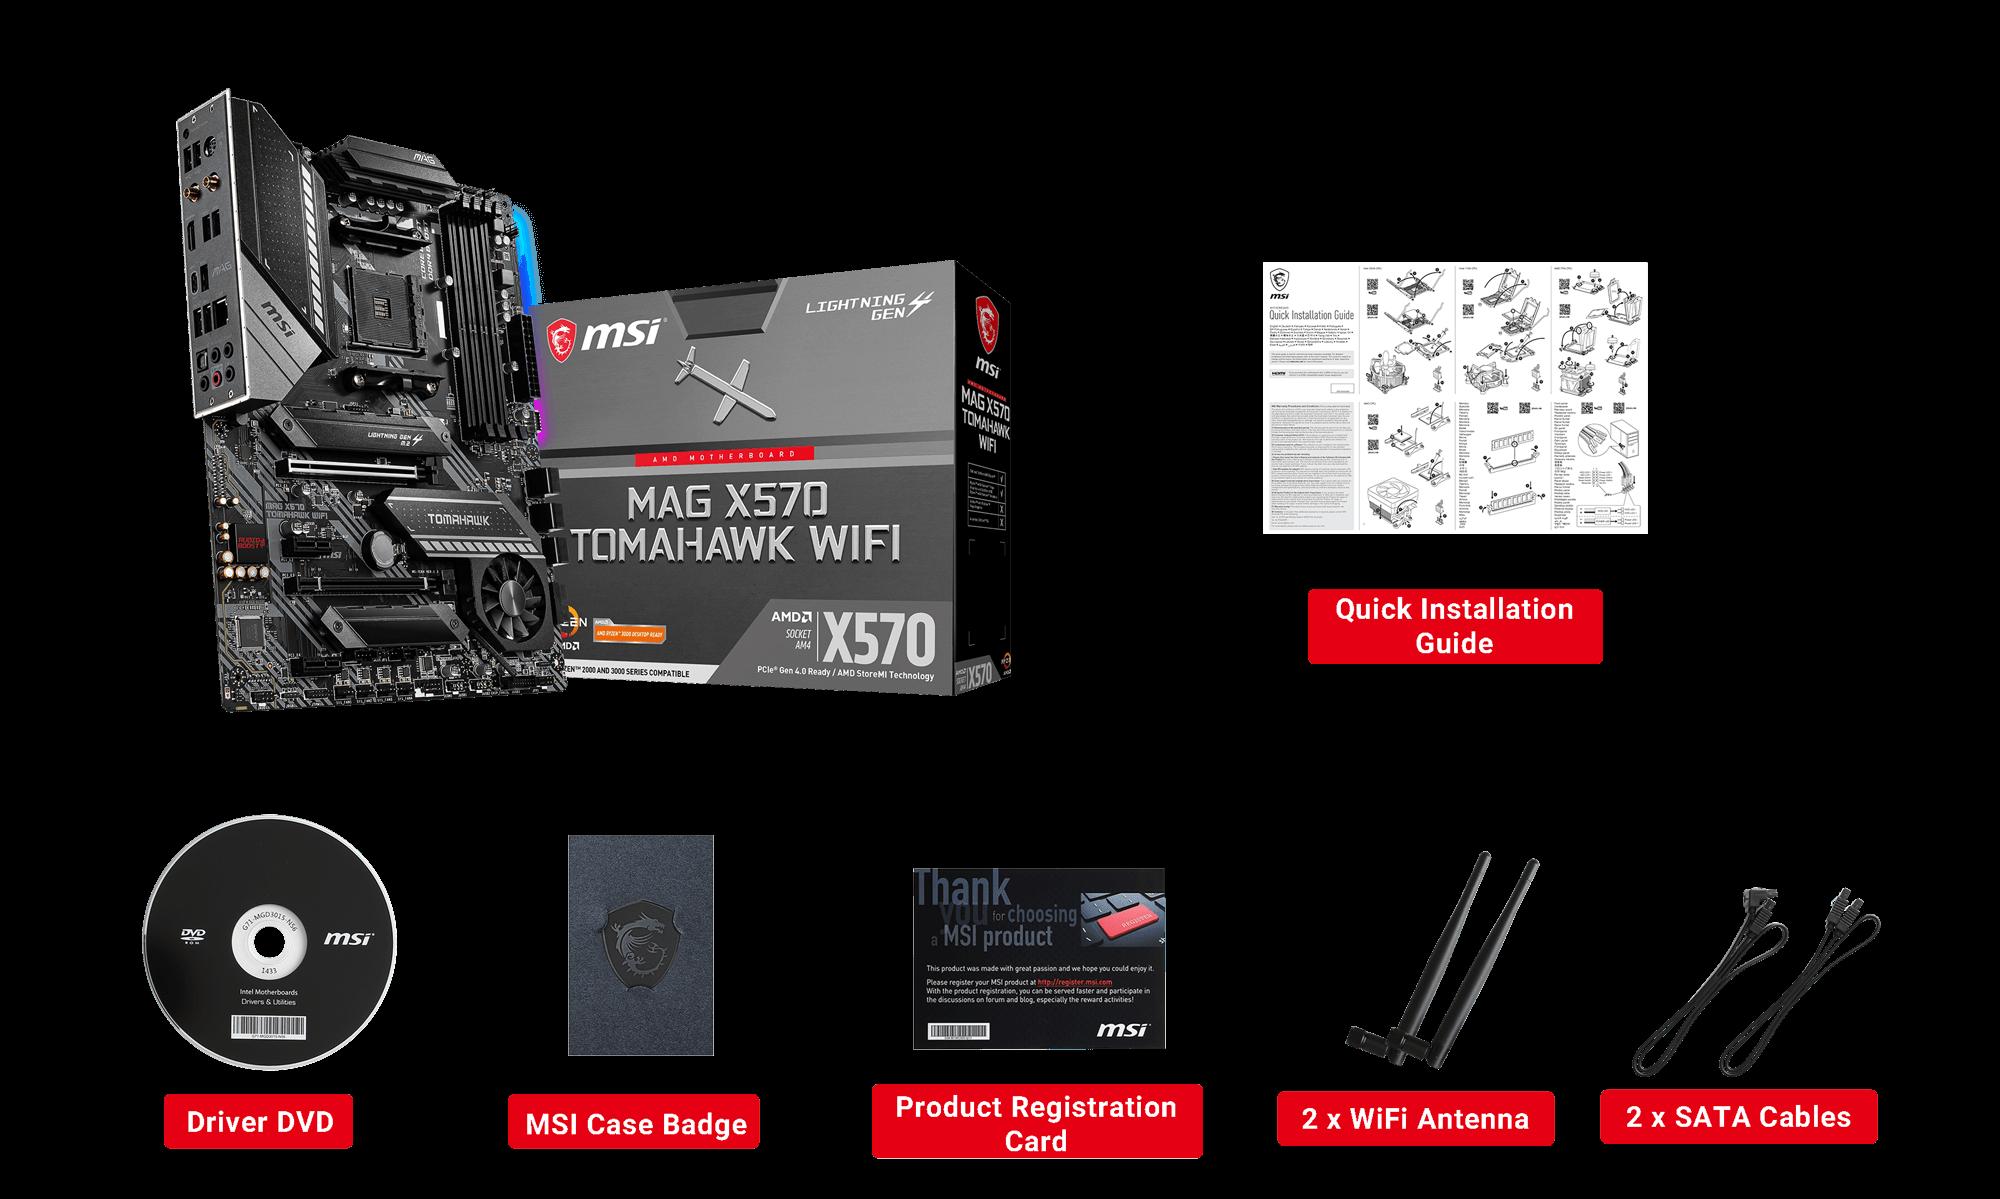 MSI MAG X570 TOMAHAWK WIFI box content